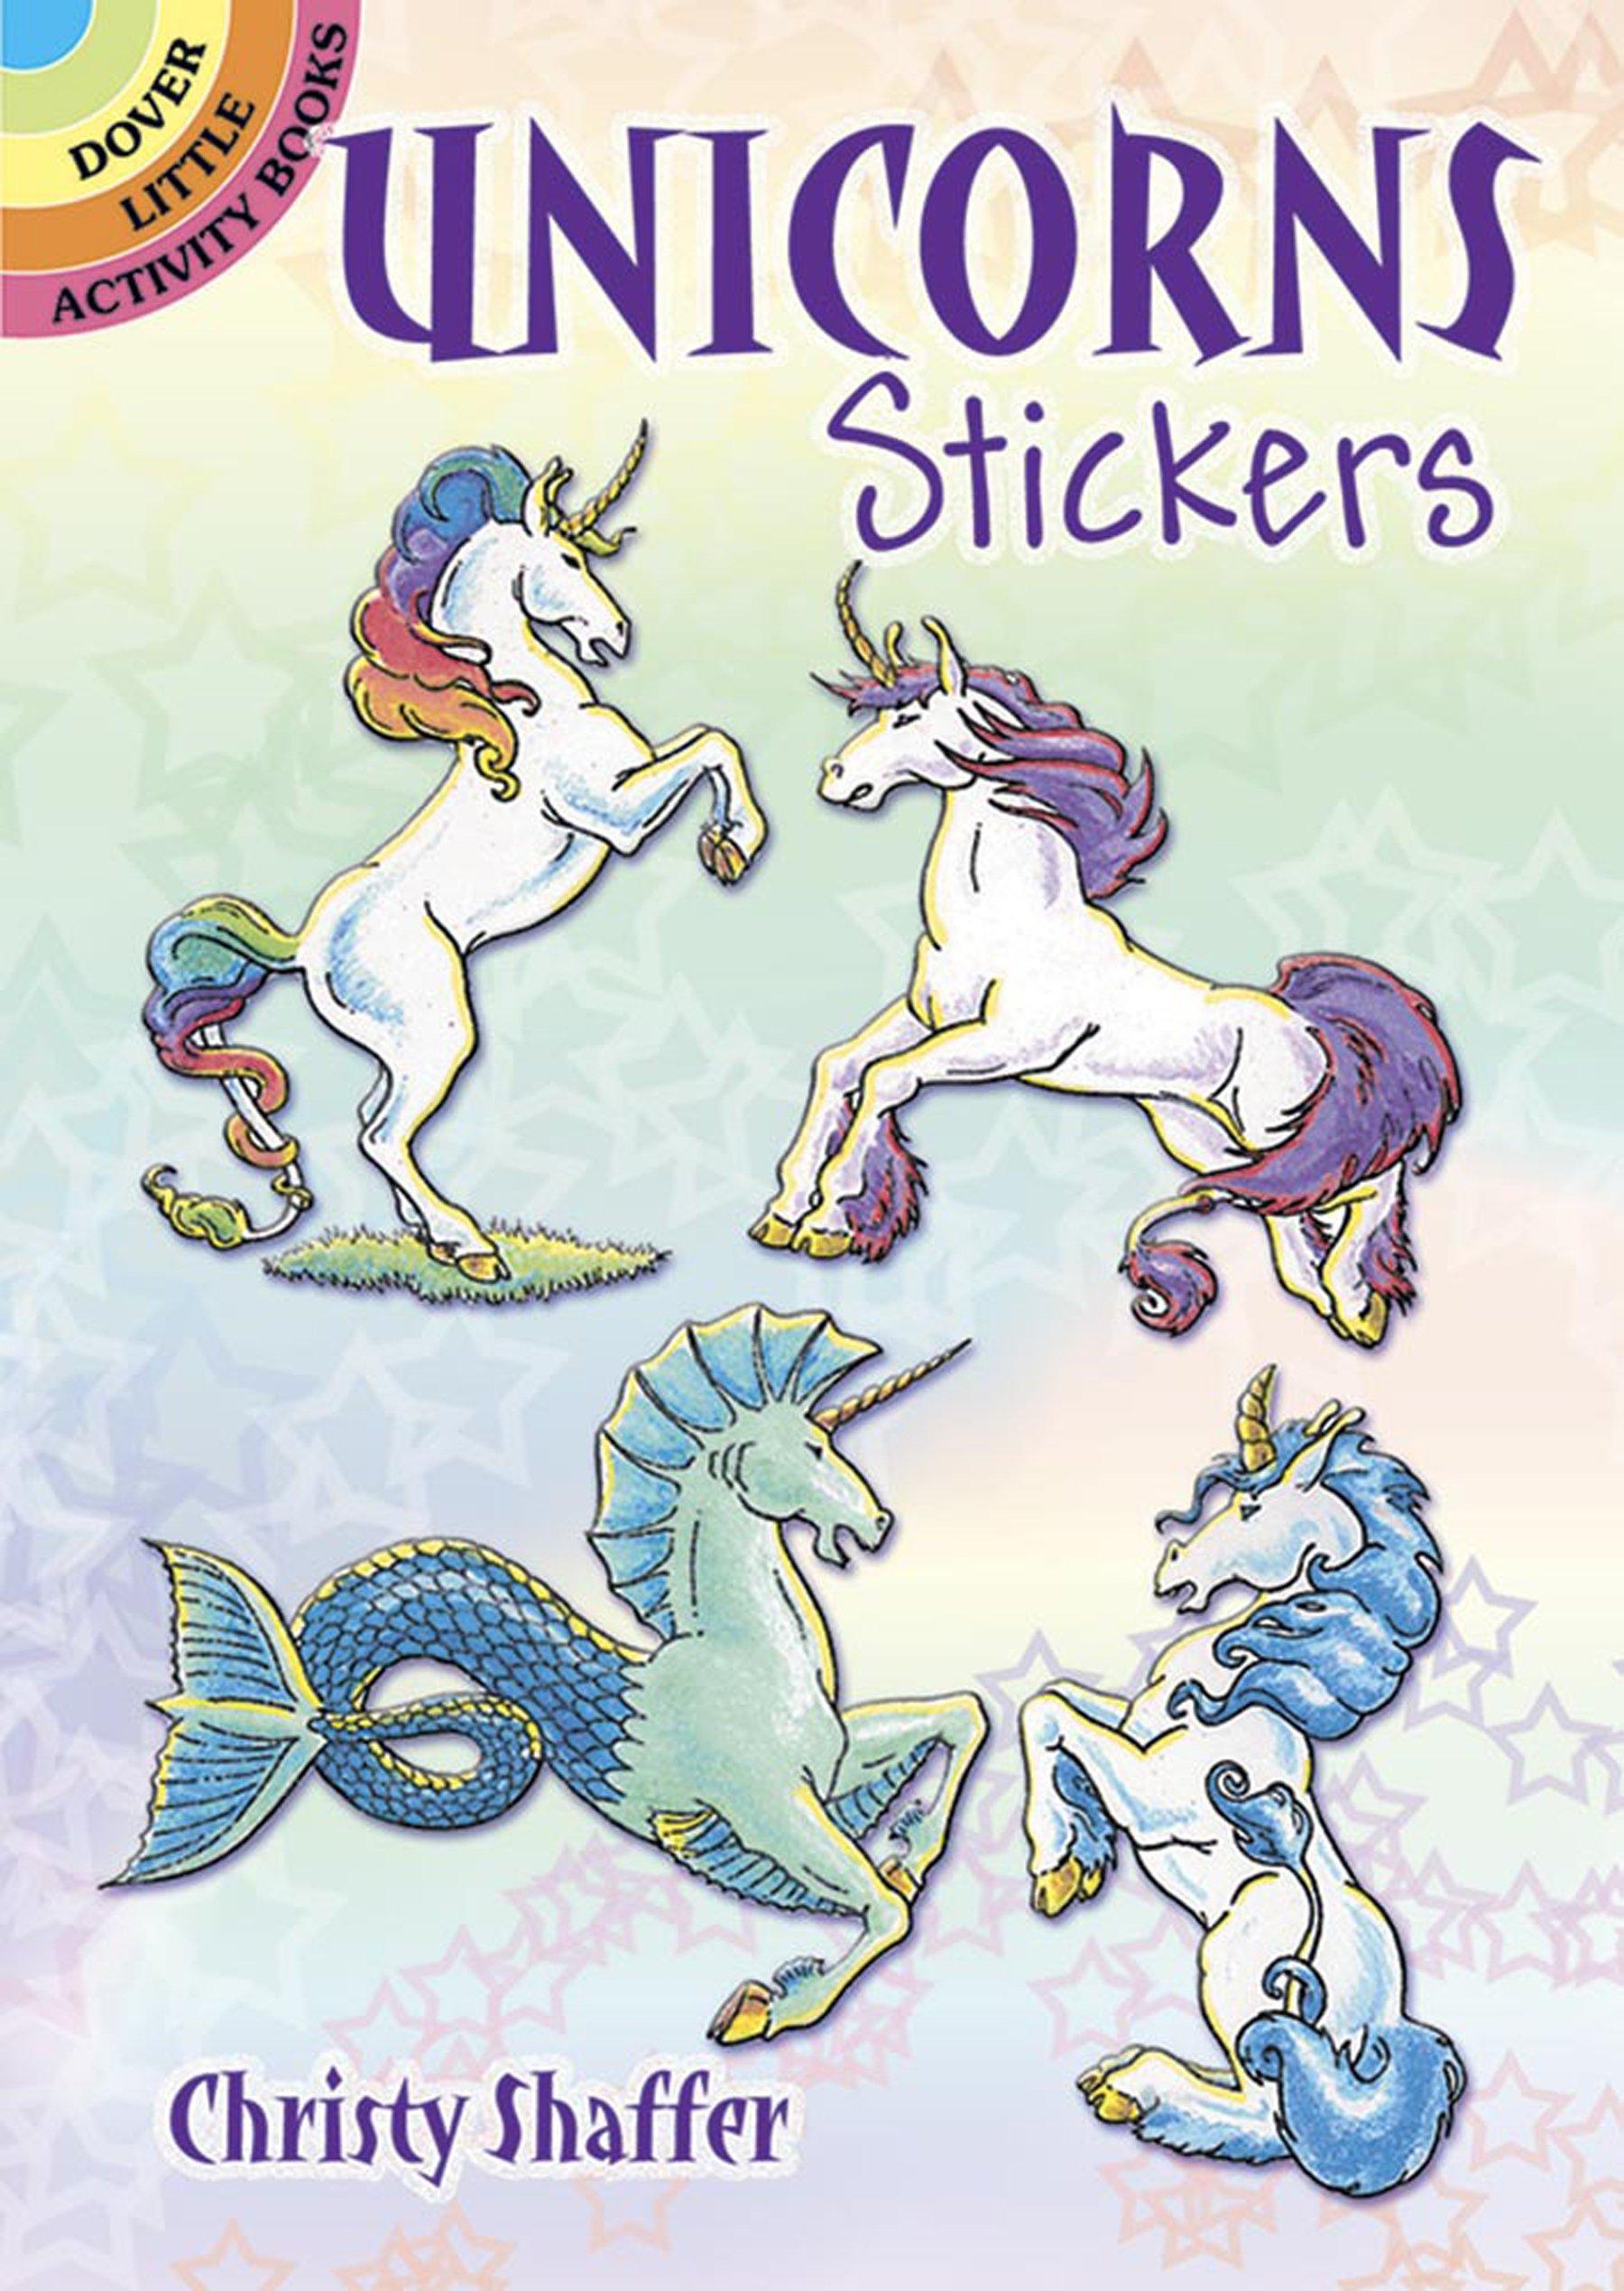 Unicorns Stickers Paperback – Jun 25 2001 Christy Shaffer Dover Publications 0486416224 Activity Books - General